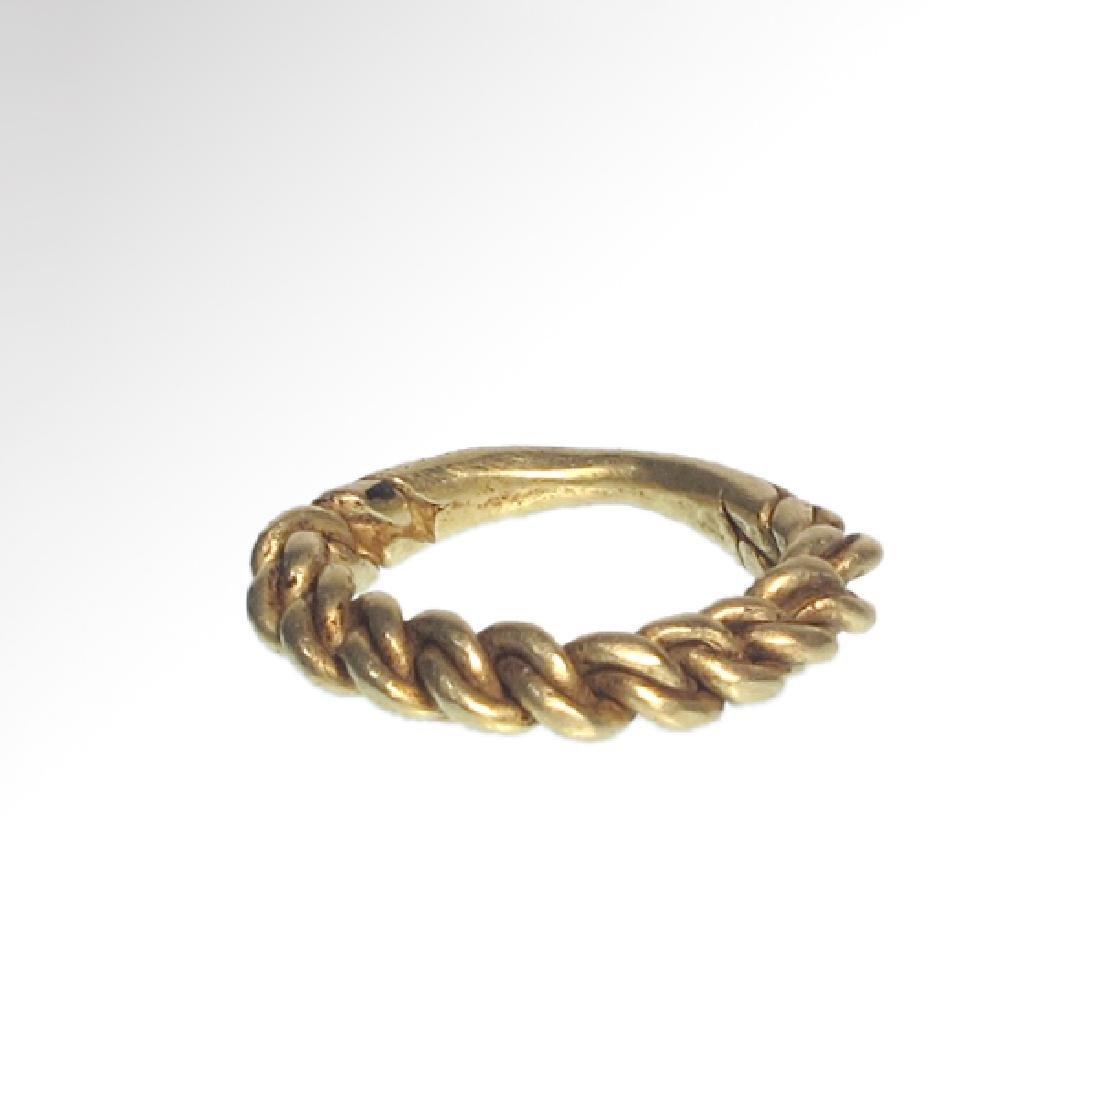 Viking Gold Ring, c. 10th Century A.D. - 3